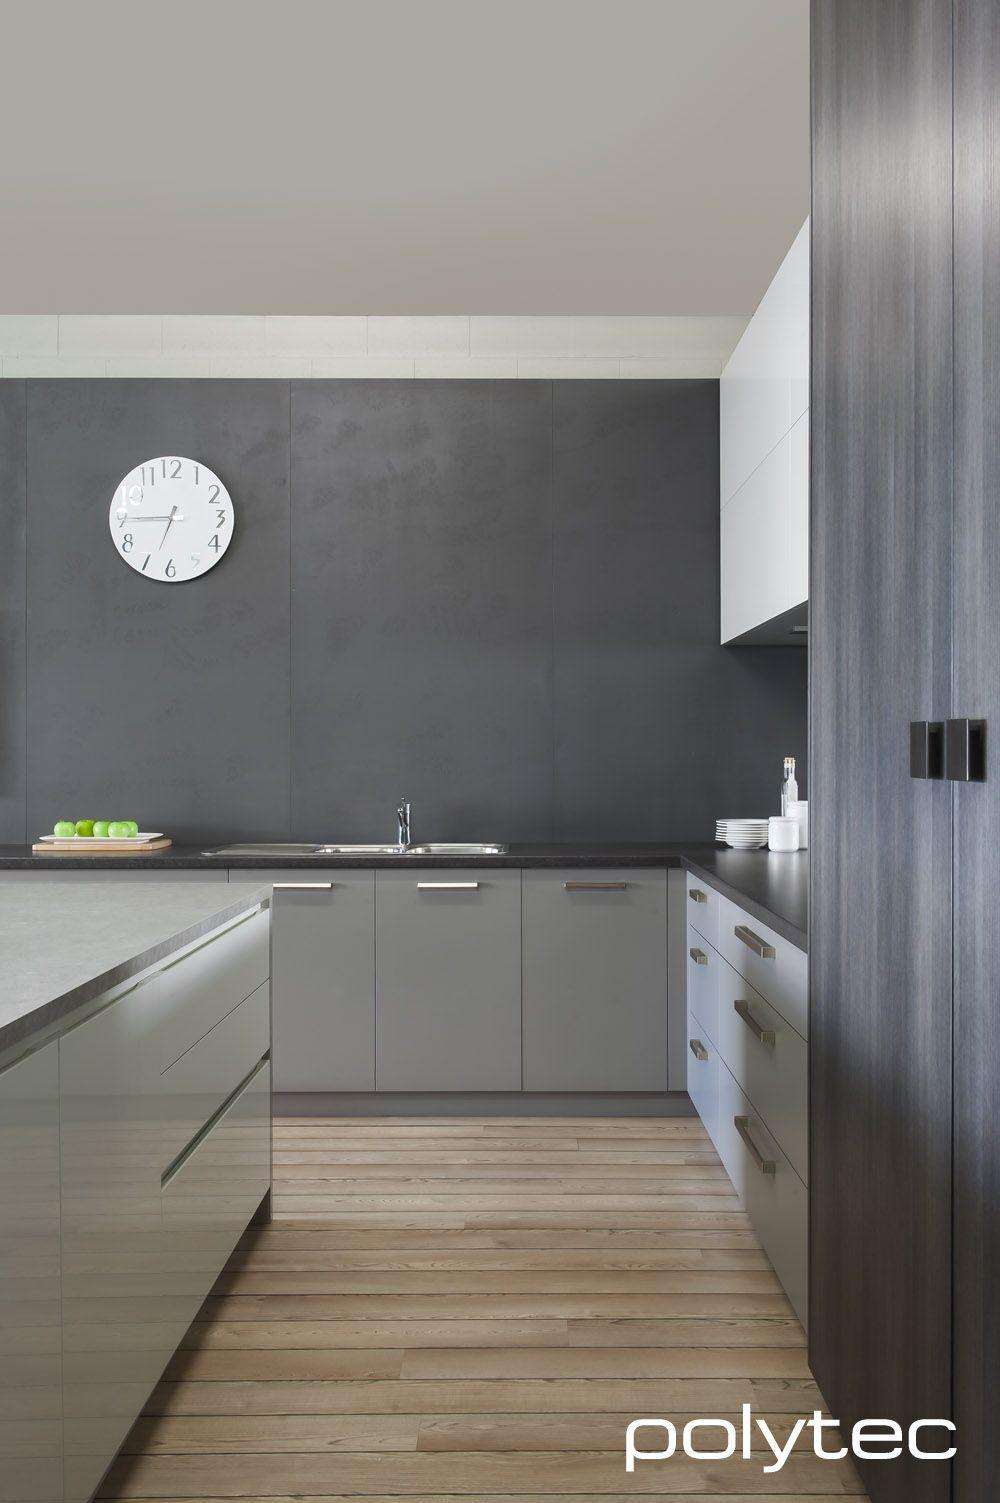 Imi Beton polytec imi beton board smooth anthracite ravine char oak laminate